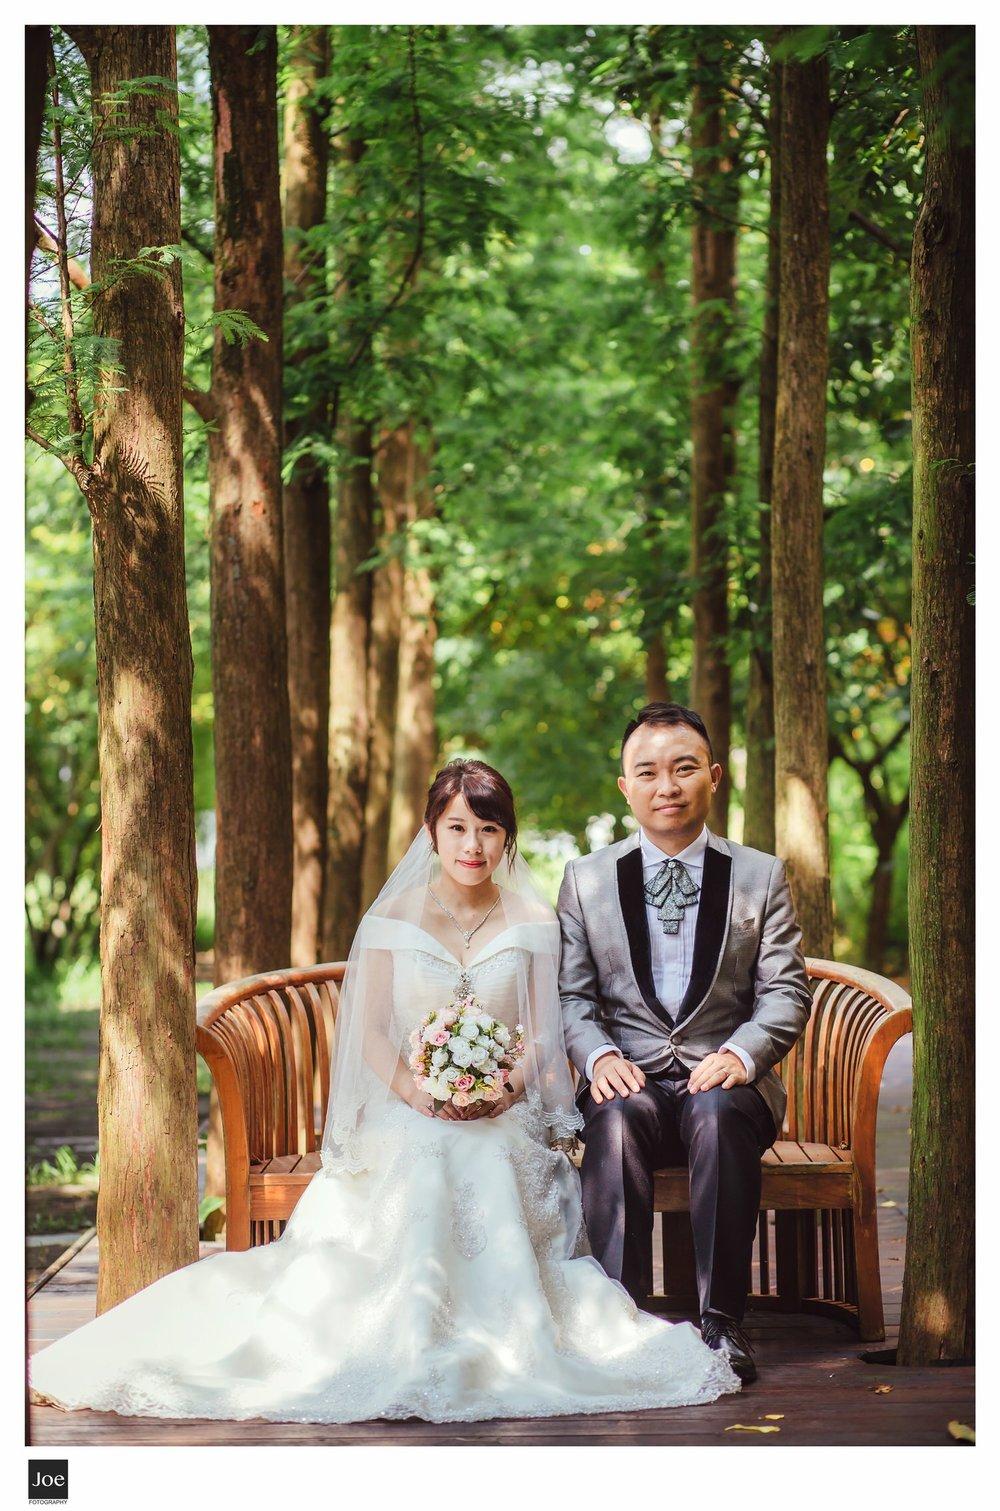 taiwan-pre-wedding-roger-wing-joe-fotography-025.jpg